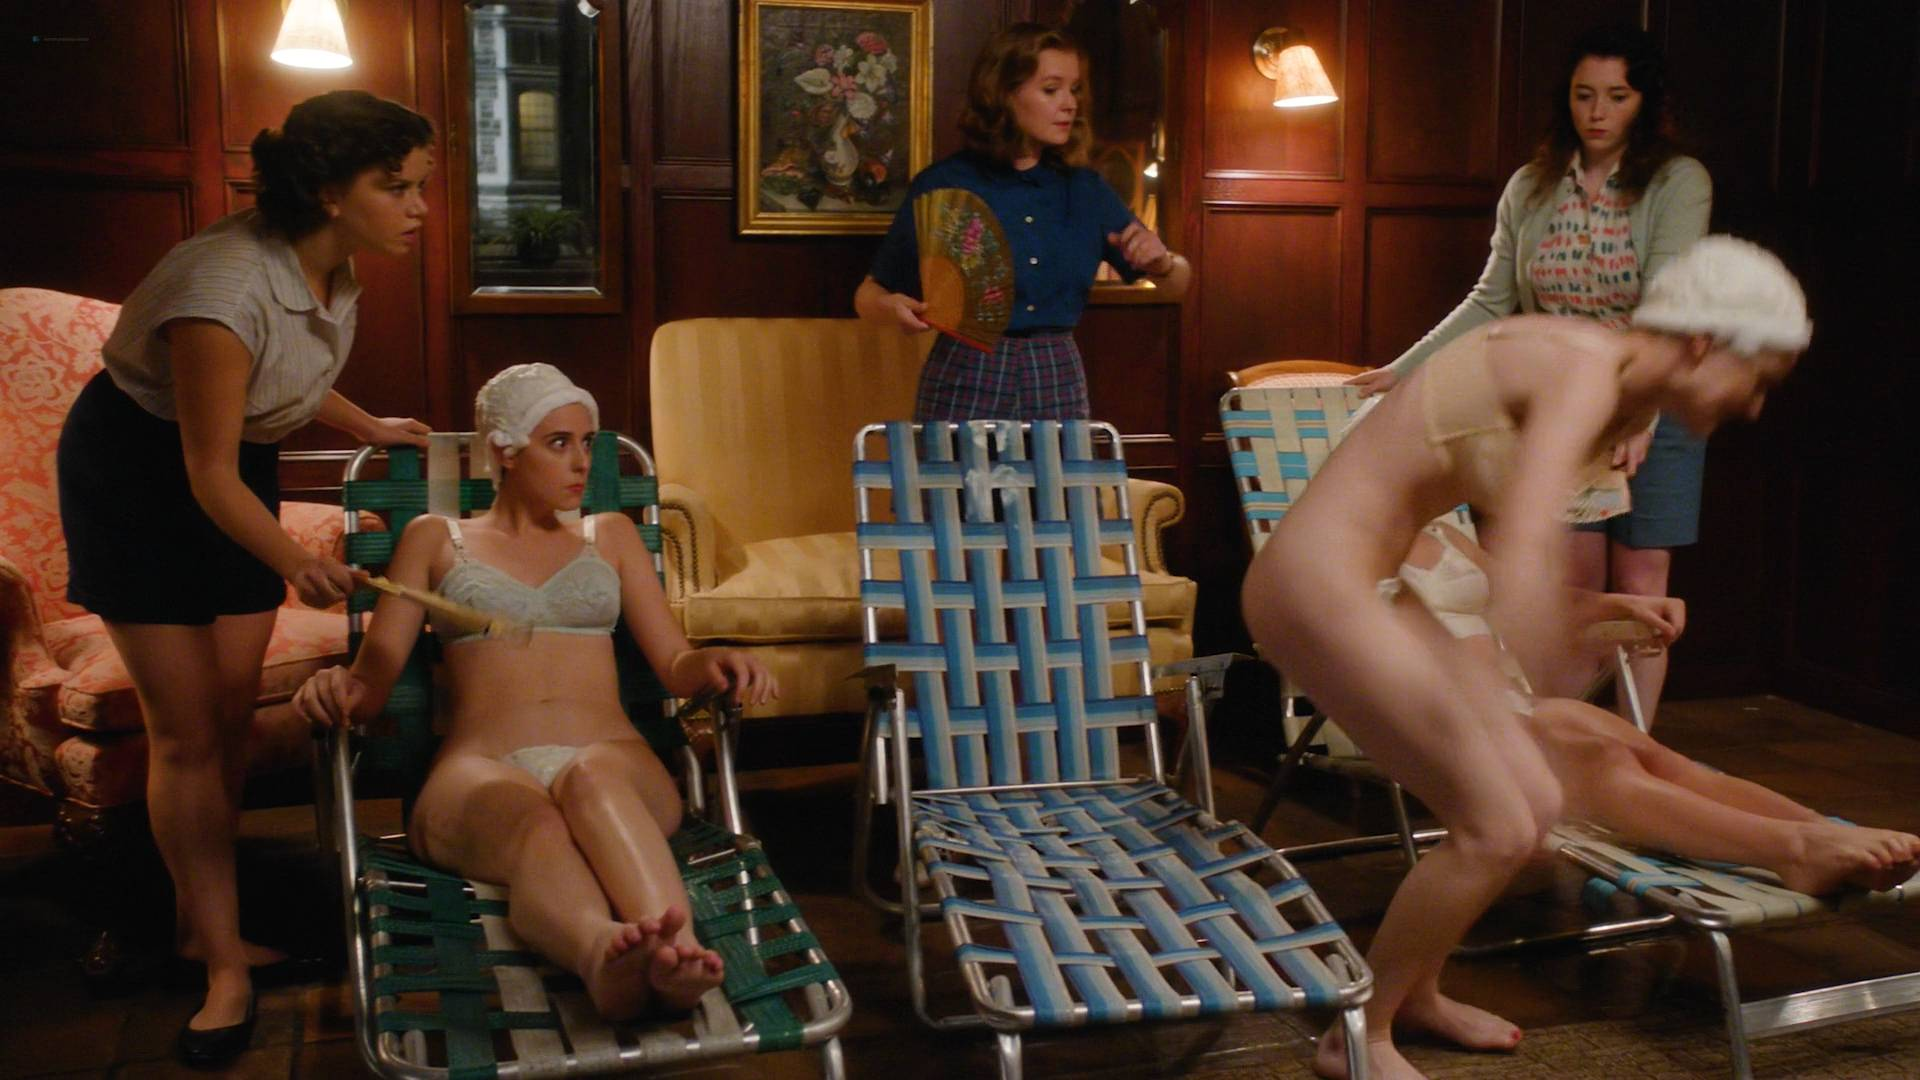 Rachel-Brosnahan-nude-topless-and-butt-Kyla-Walker-hot-The-Marvelous-Mrs-Maisel-2017-s1e1-HD-1080p-00002.jpg